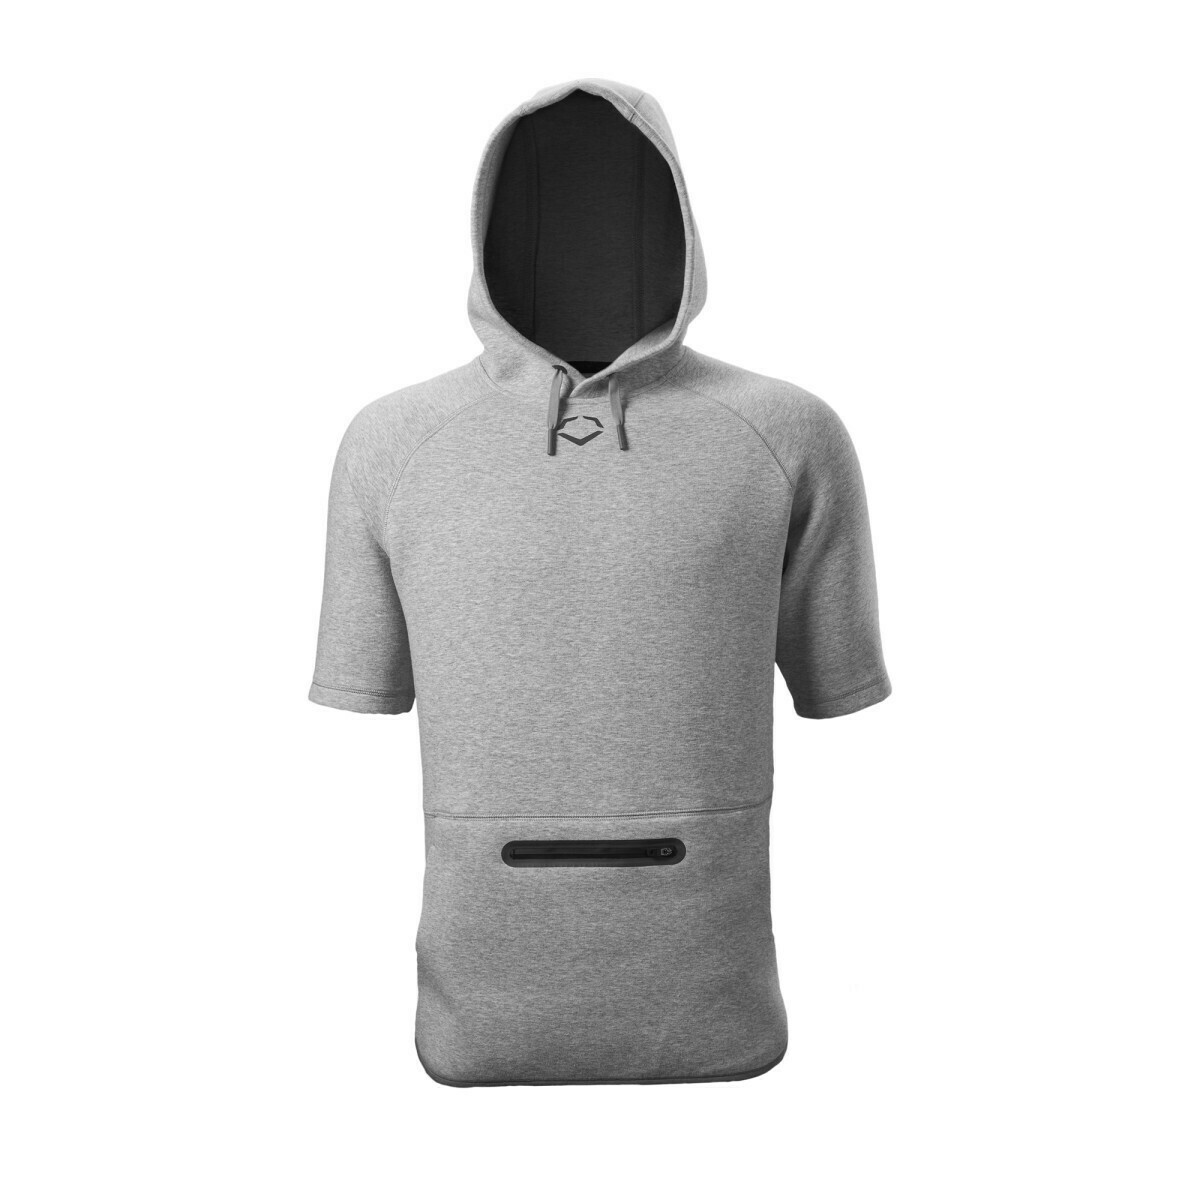 Evo Shield Pro Team Short Sleeve Hoodie